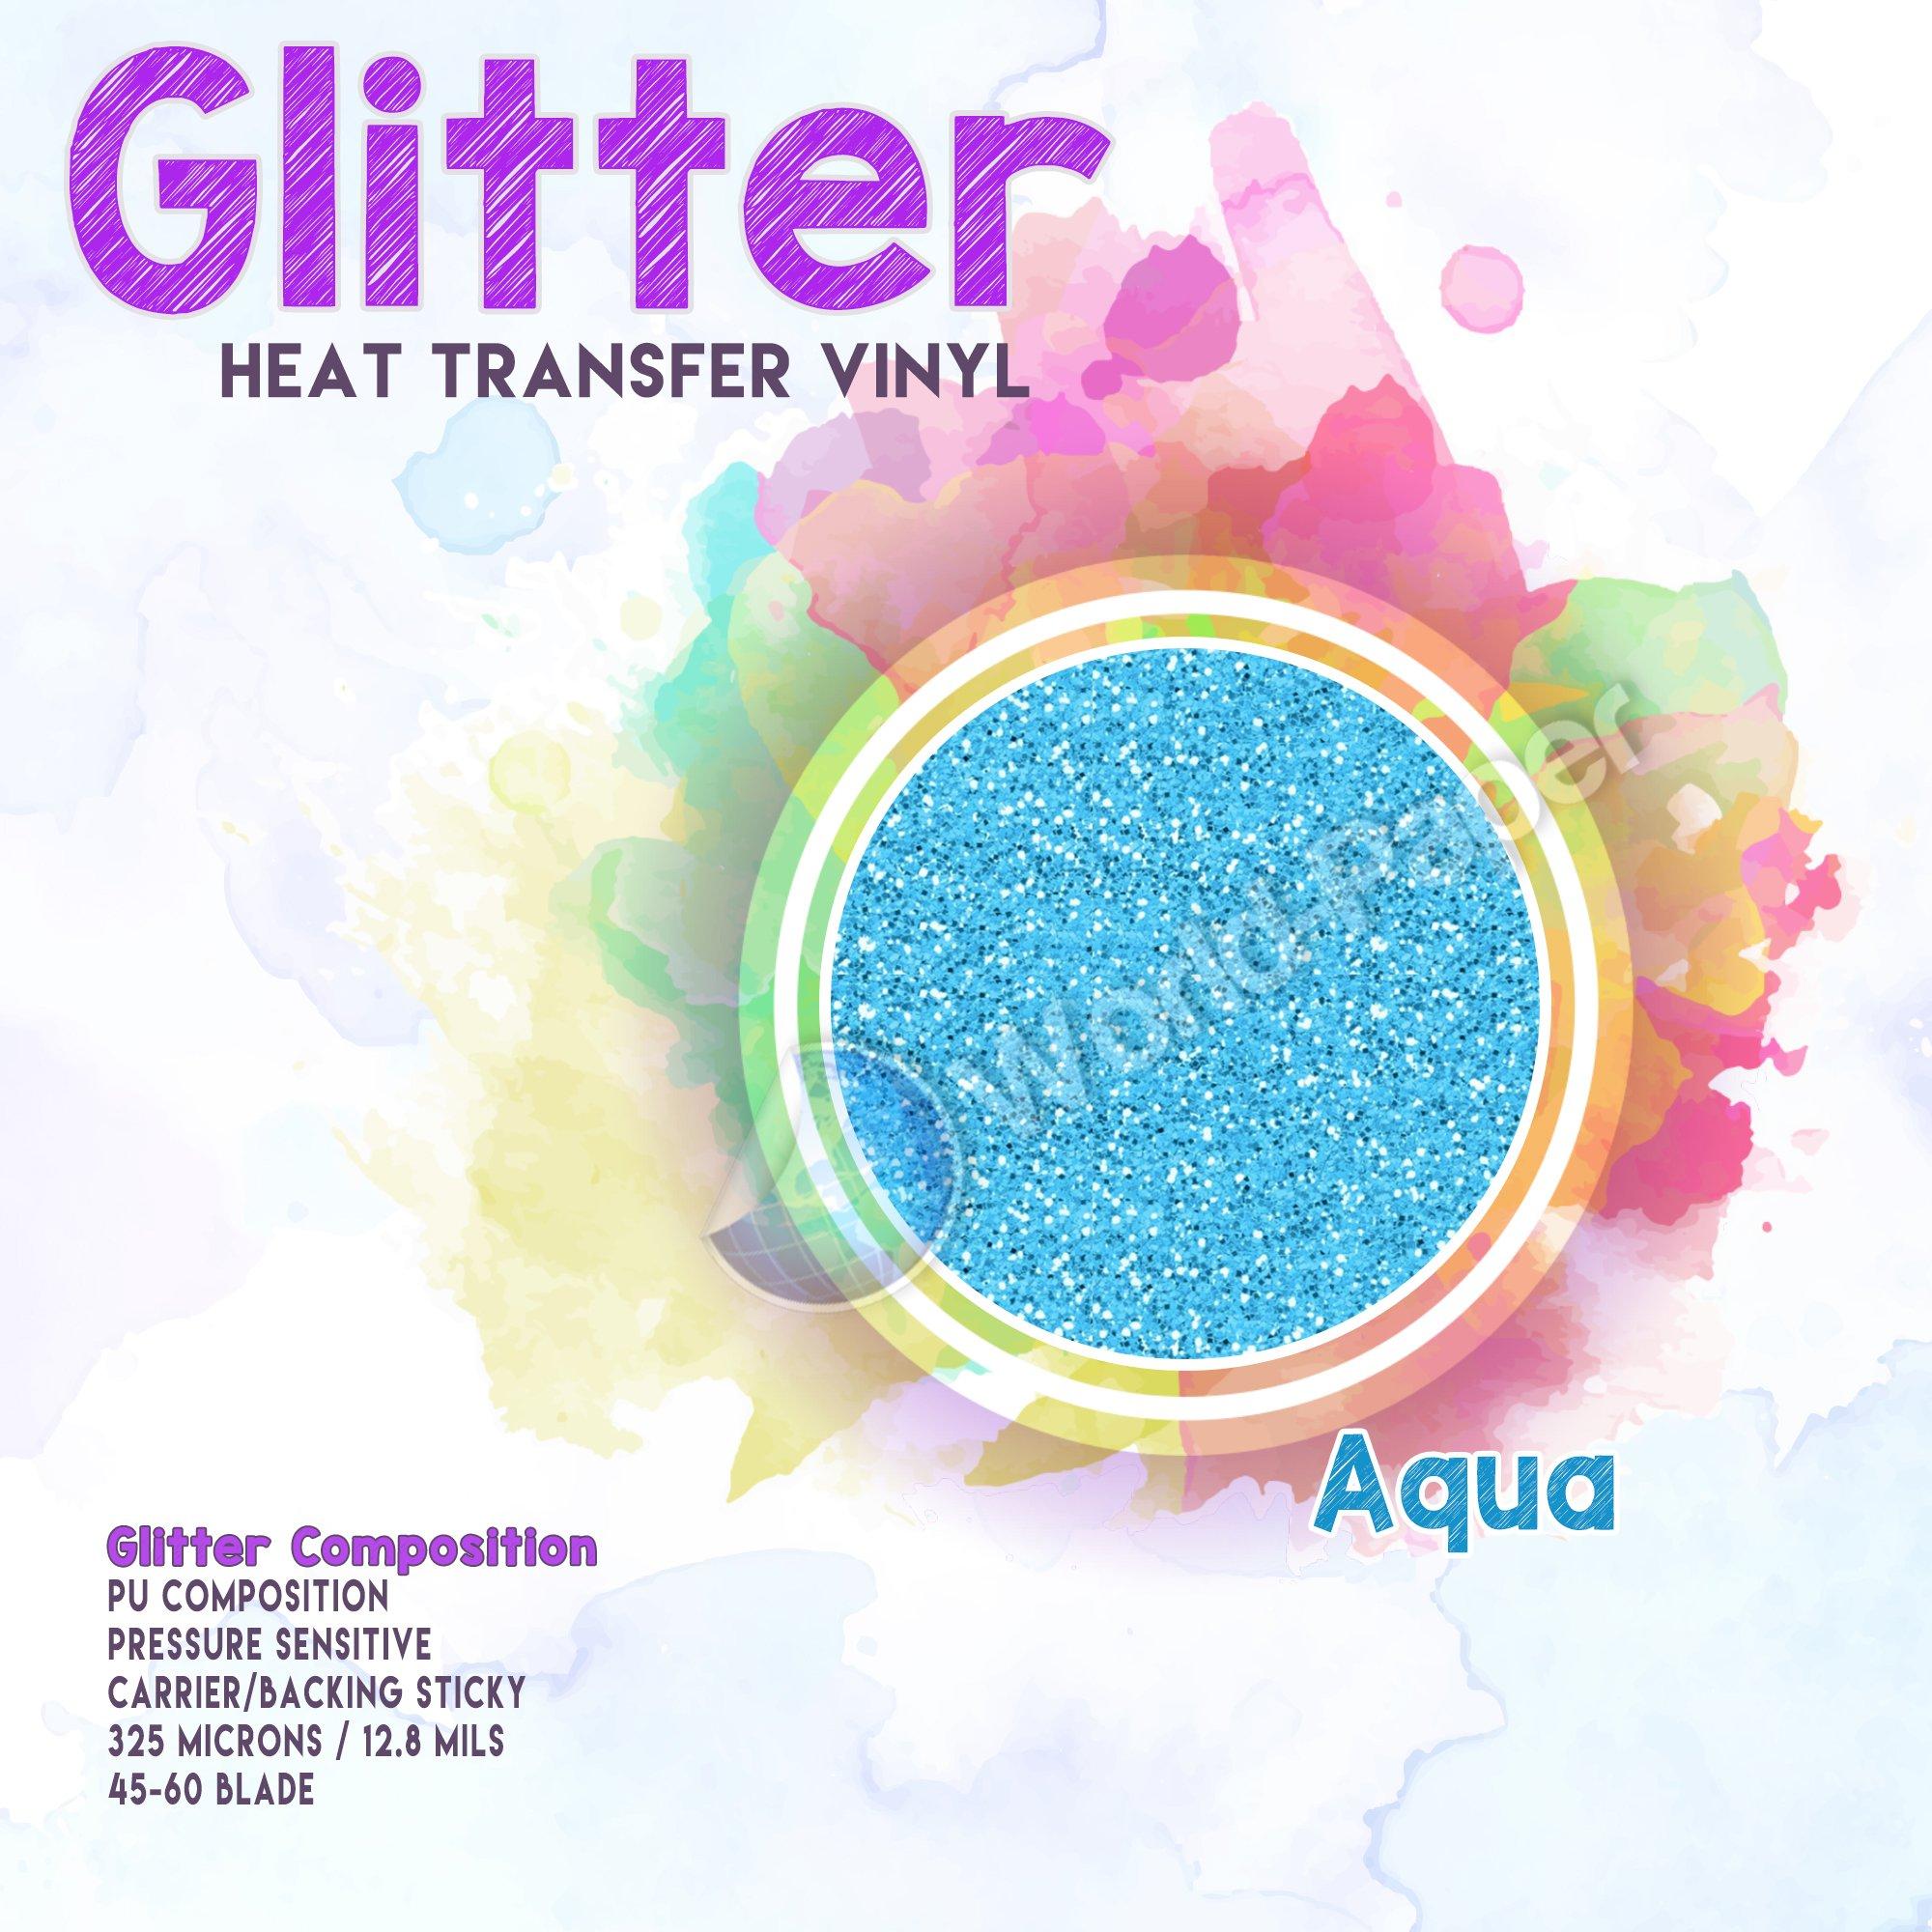 Glitter Heat Transfer Vinyl (HTV) WORLD - PAPER 20'' x 5Yd Silver (Aqua) by world-paper